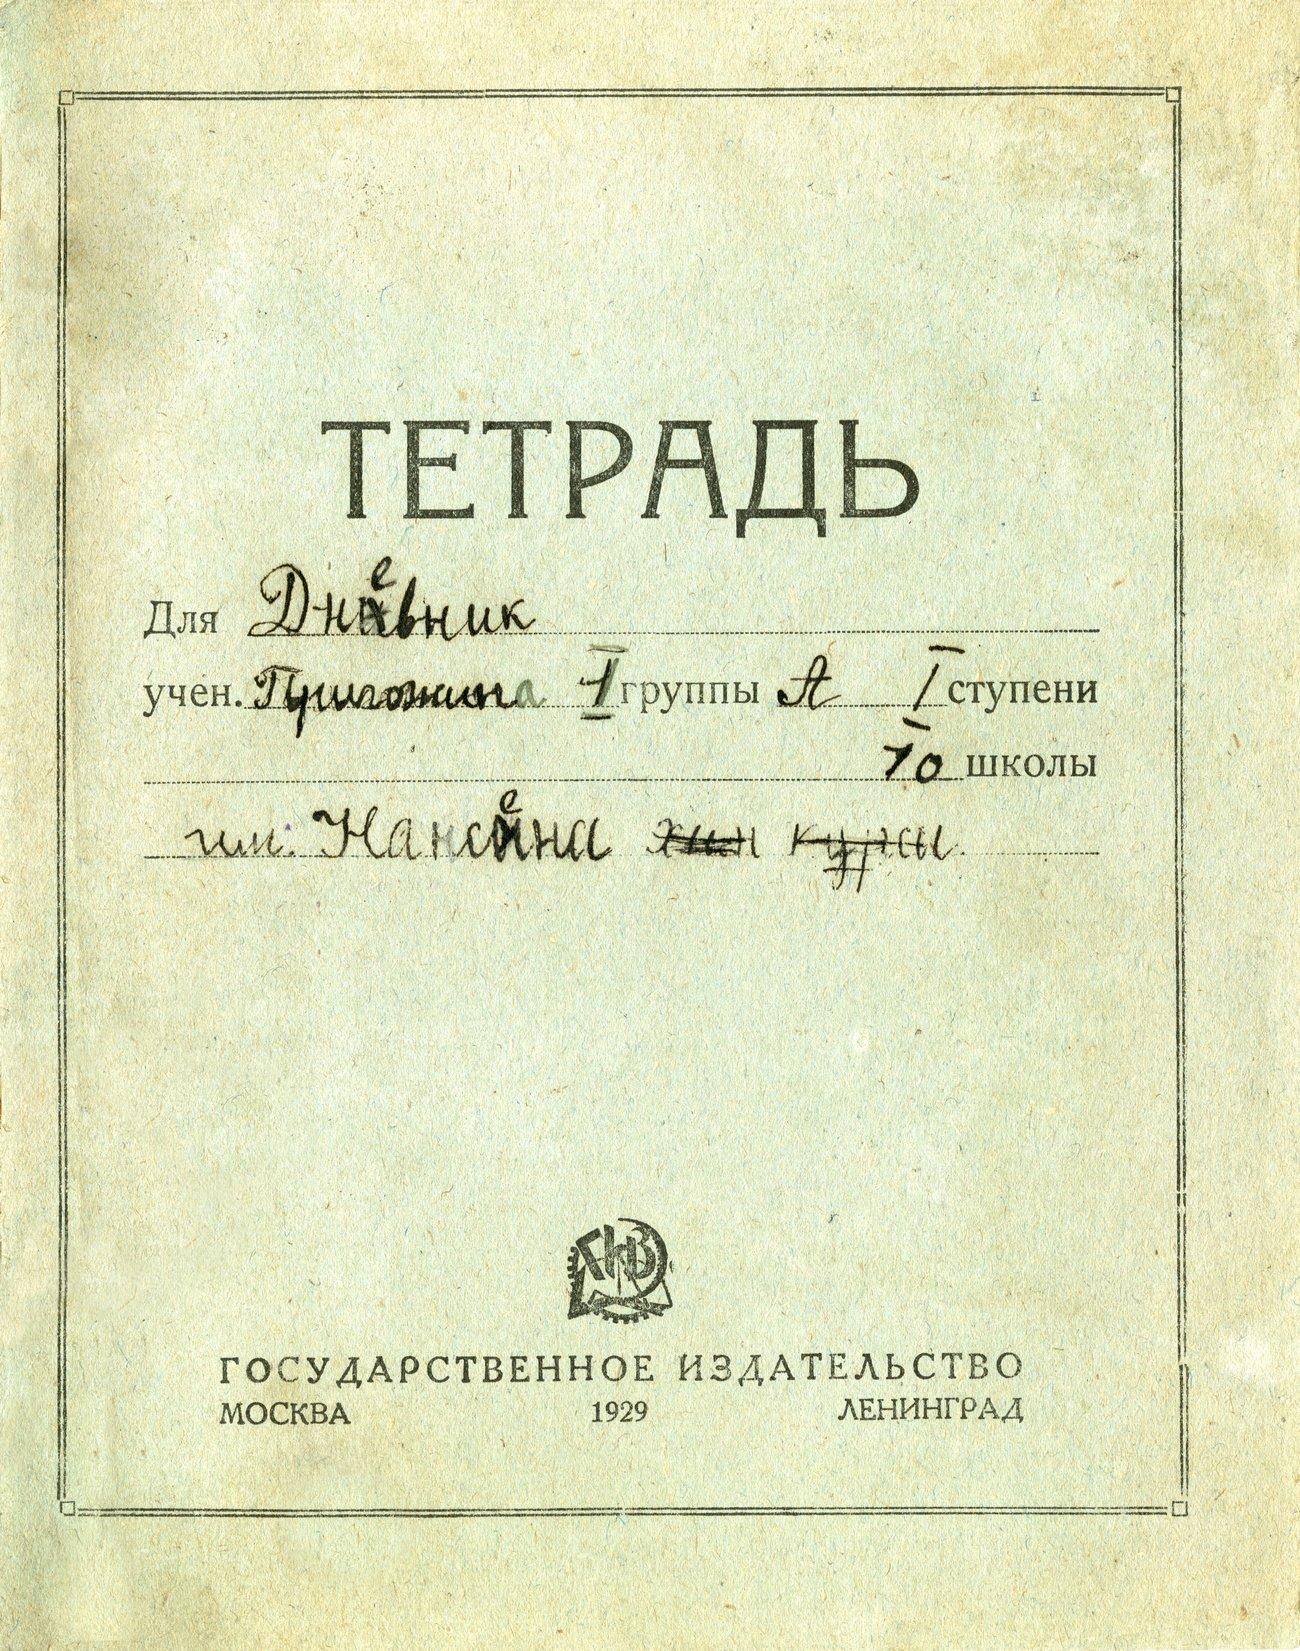 Тетрадь СССР 34